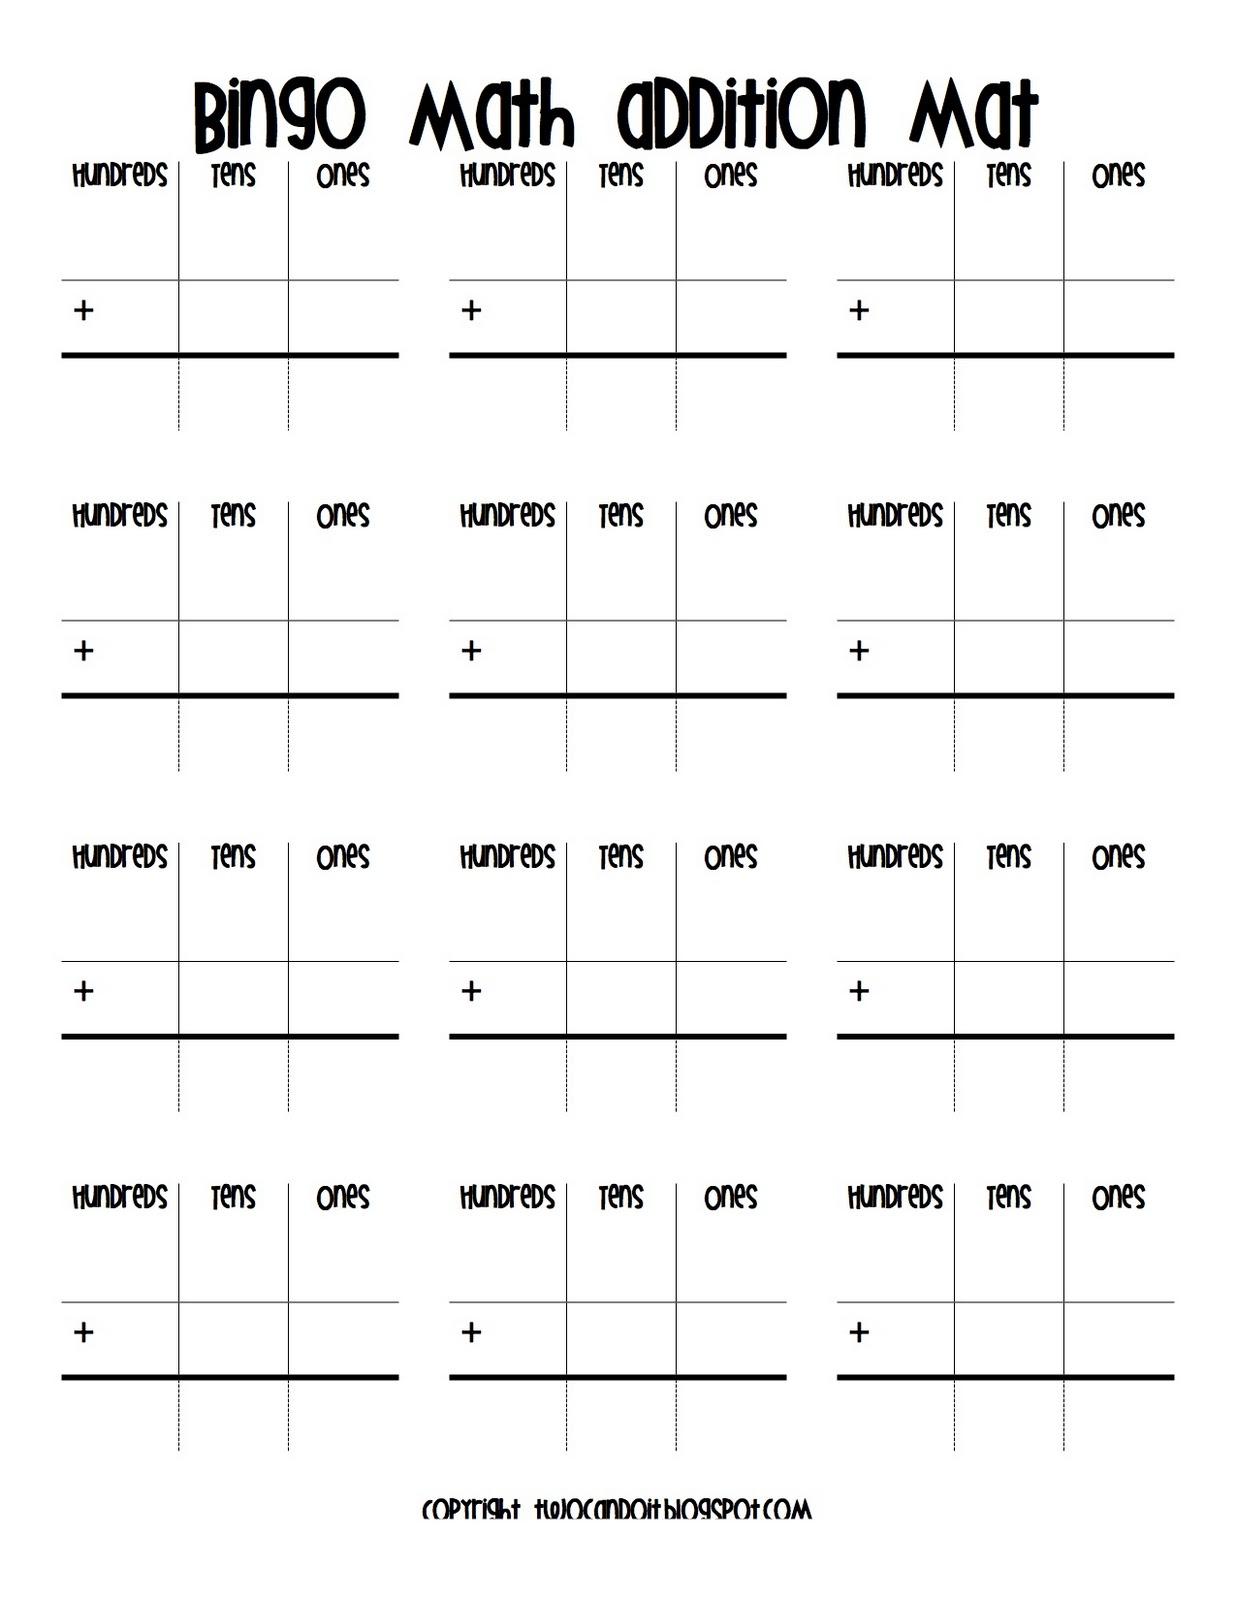 graphic regarding Addition Bingo Printable identified as 2 Can Do It: Bingo Everyone????